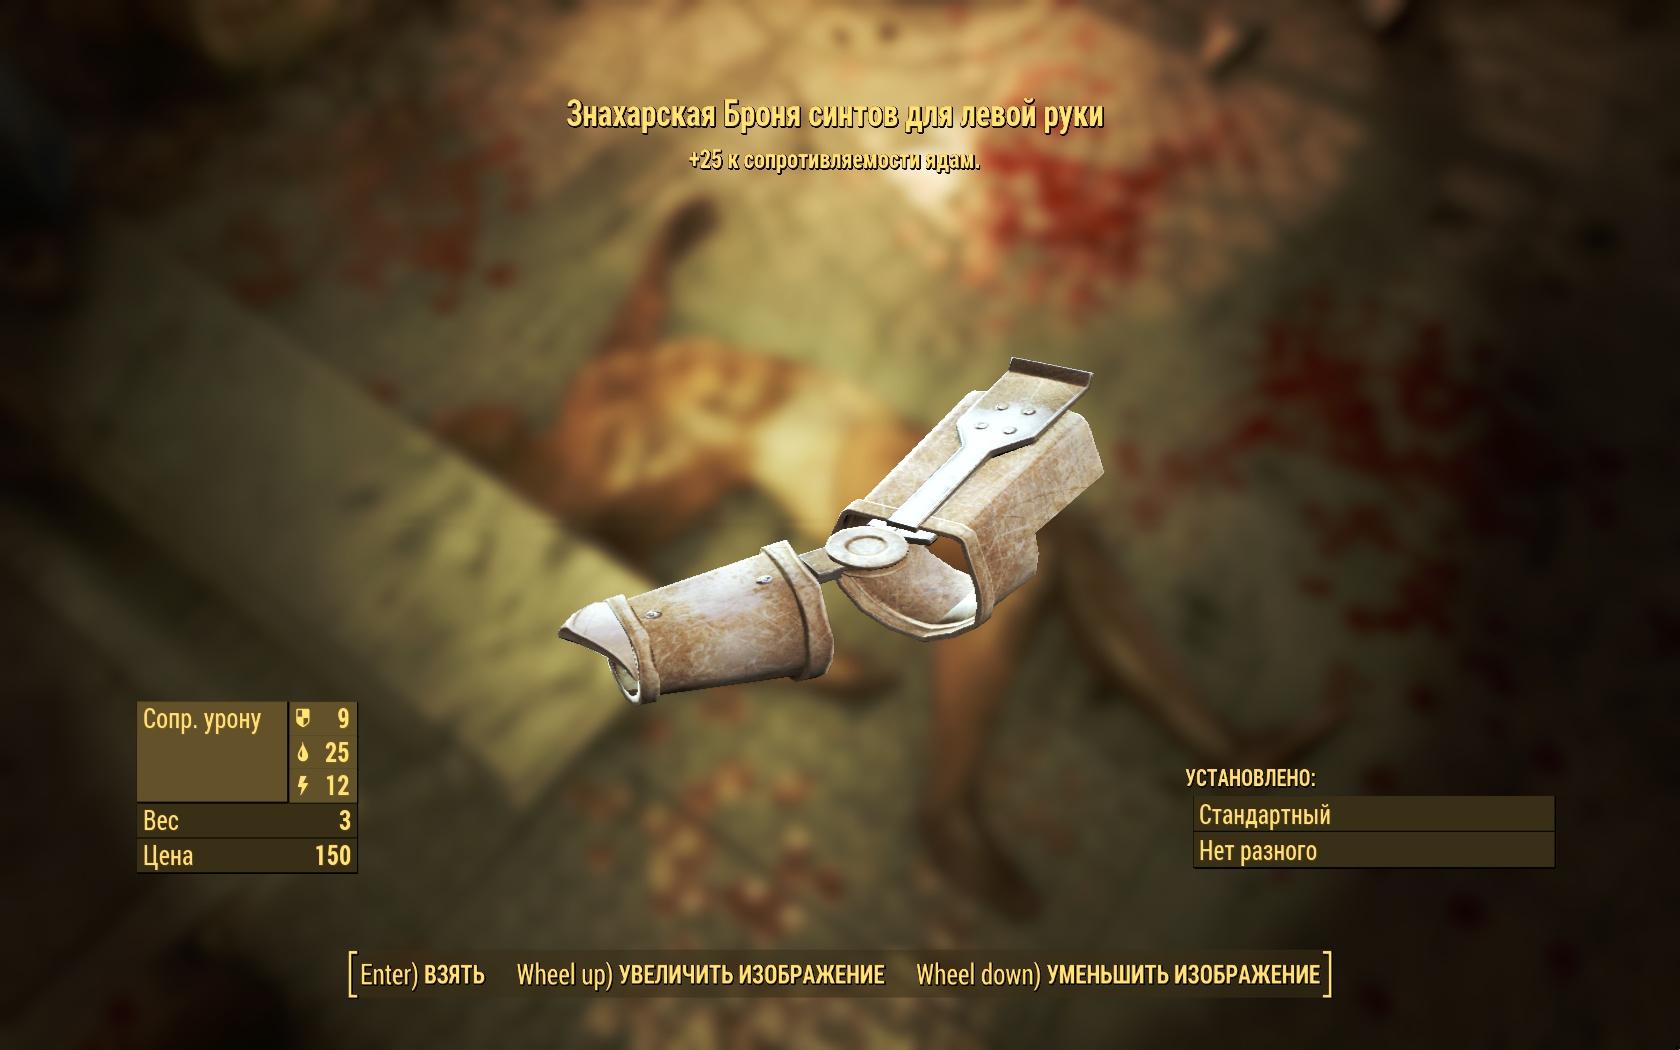 Знахарская броня синтов для левой руки - Fallout 4 броня, Знахарская, Одежда